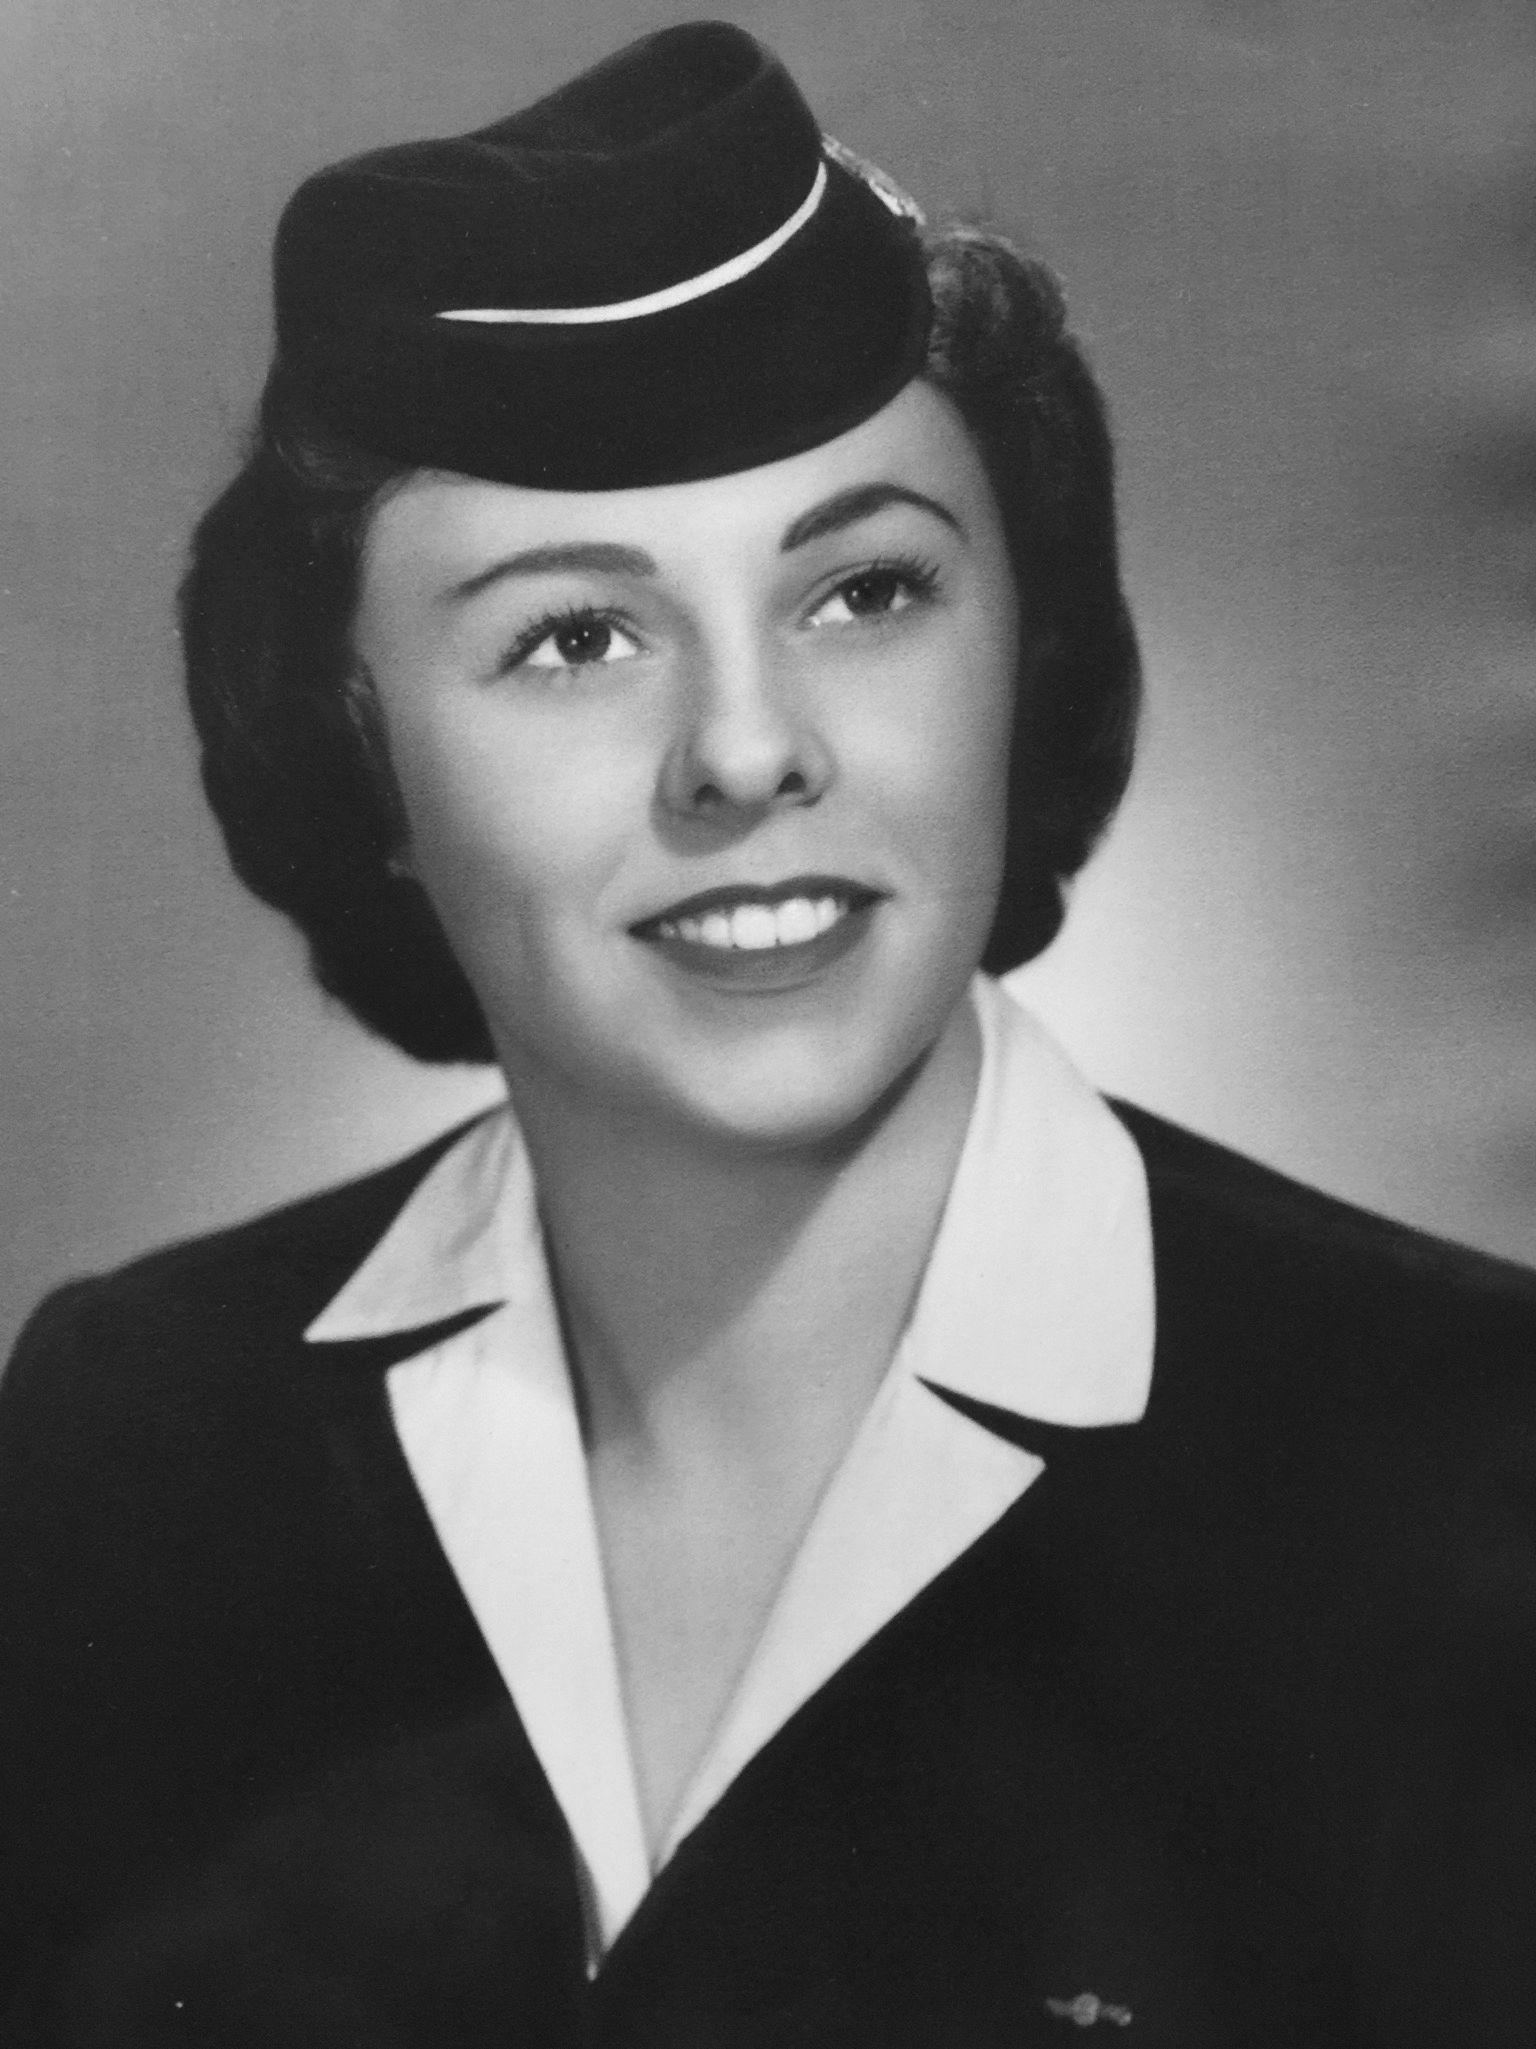 Polly Goodman